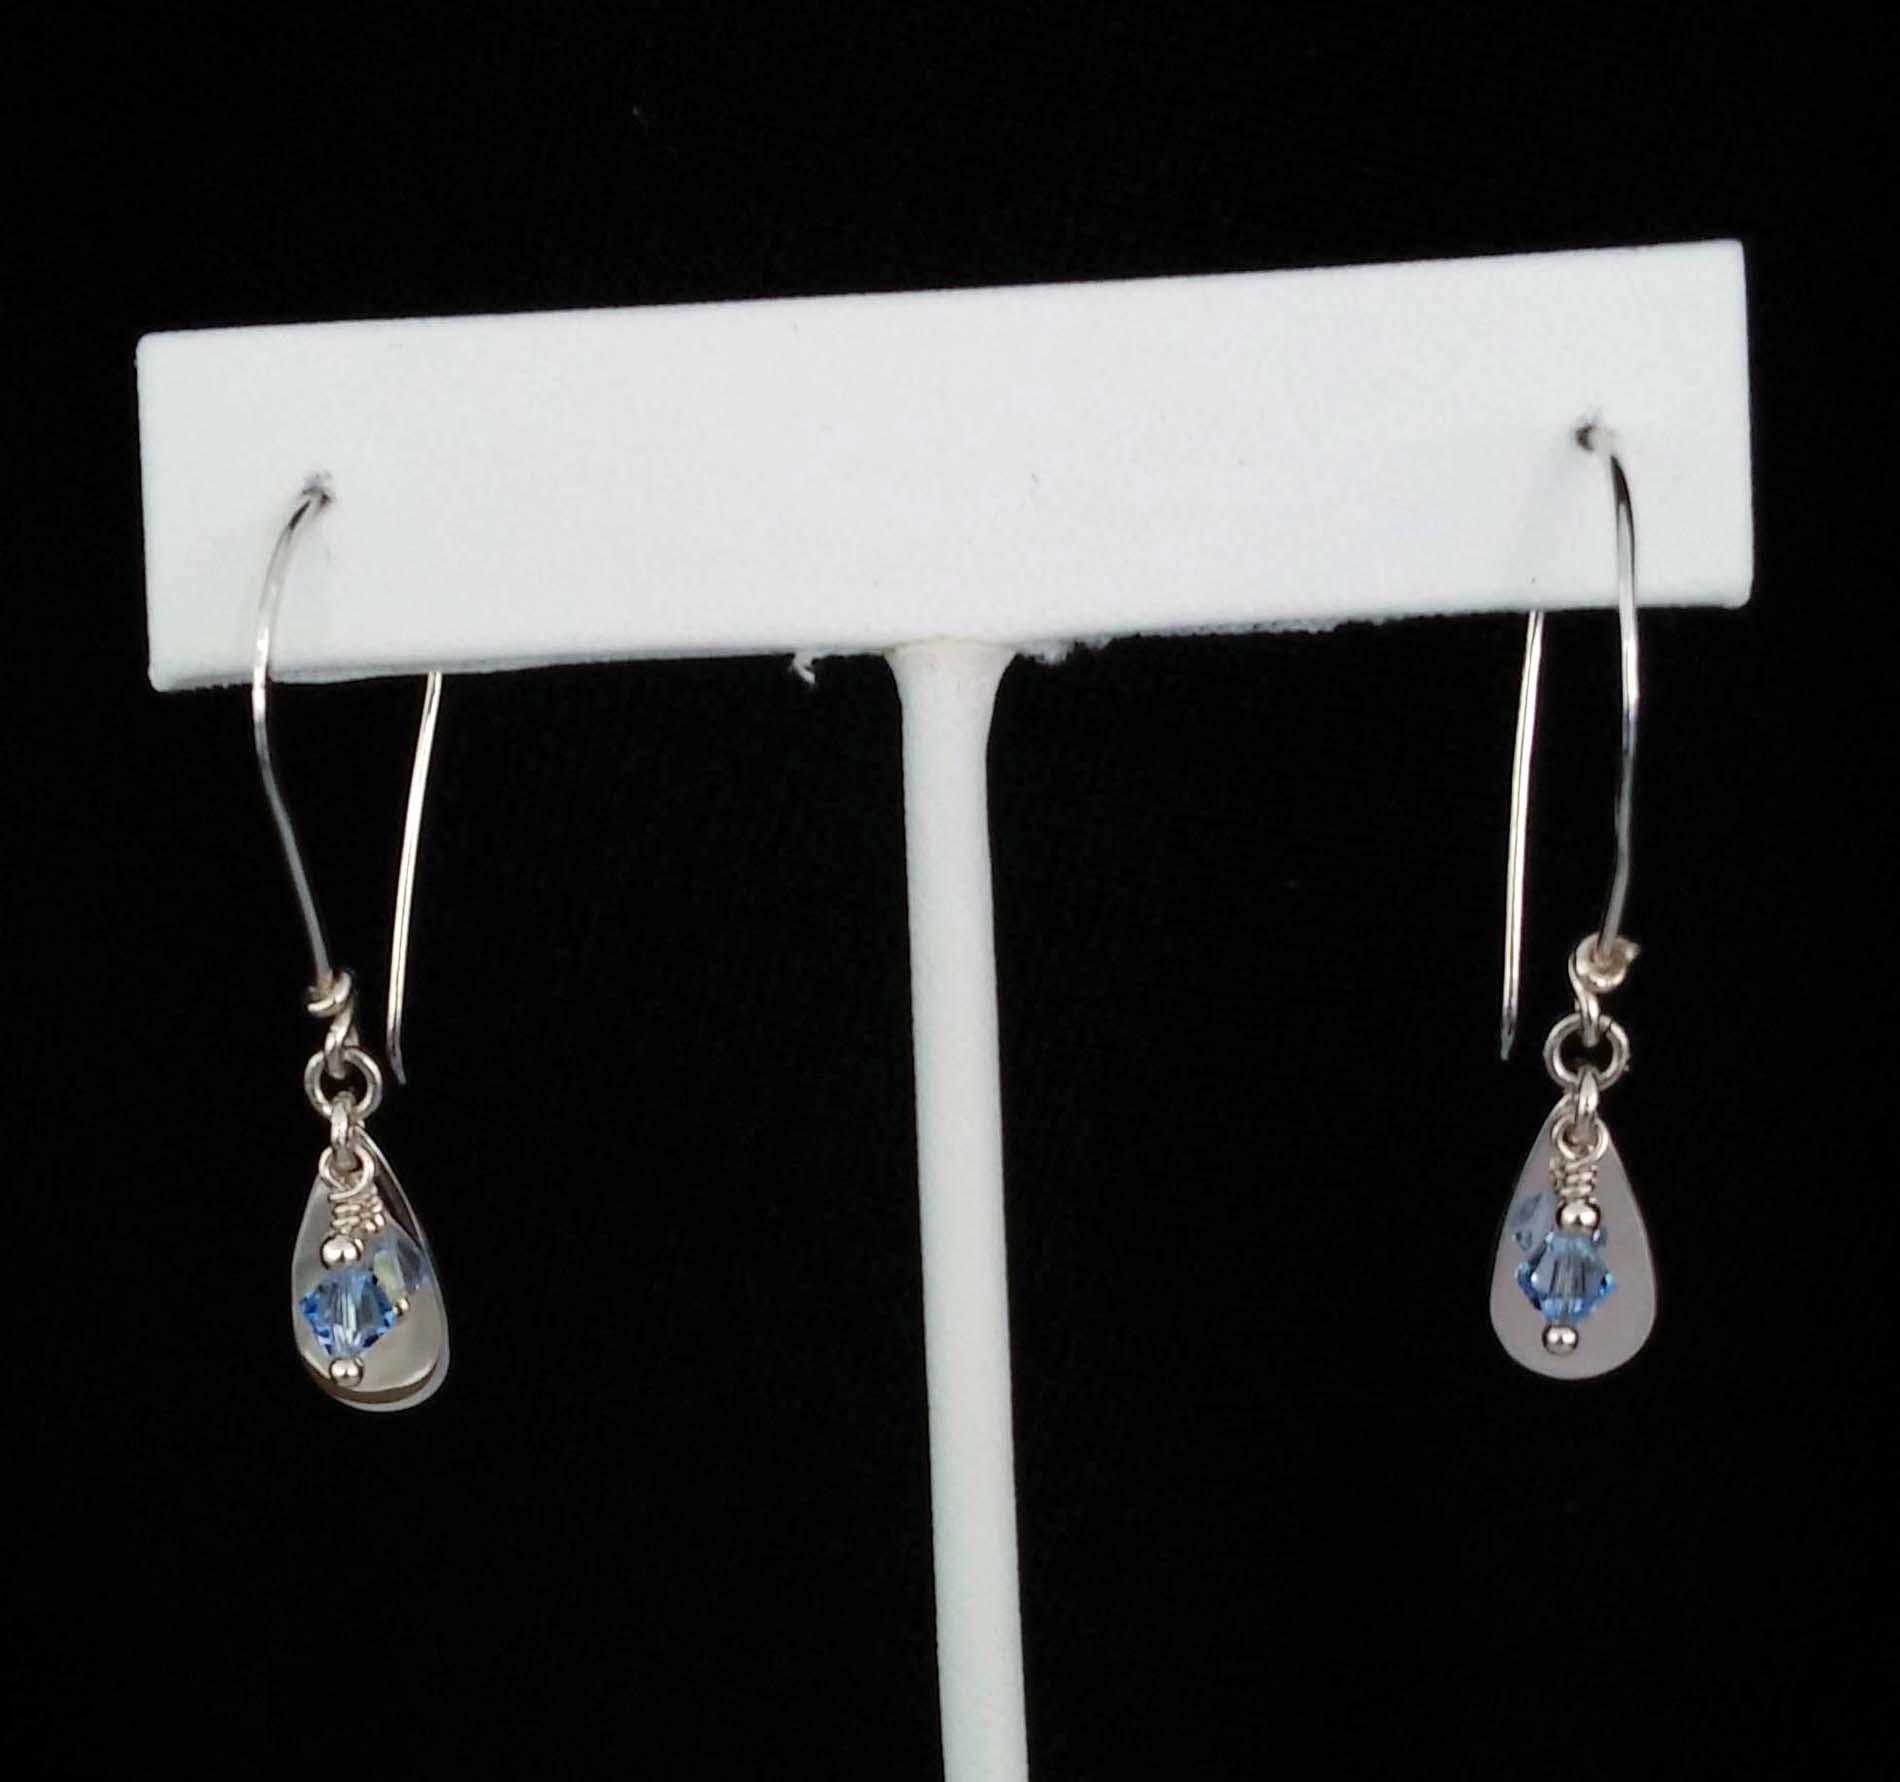 Small Teardrop Earrings with Blue Beads